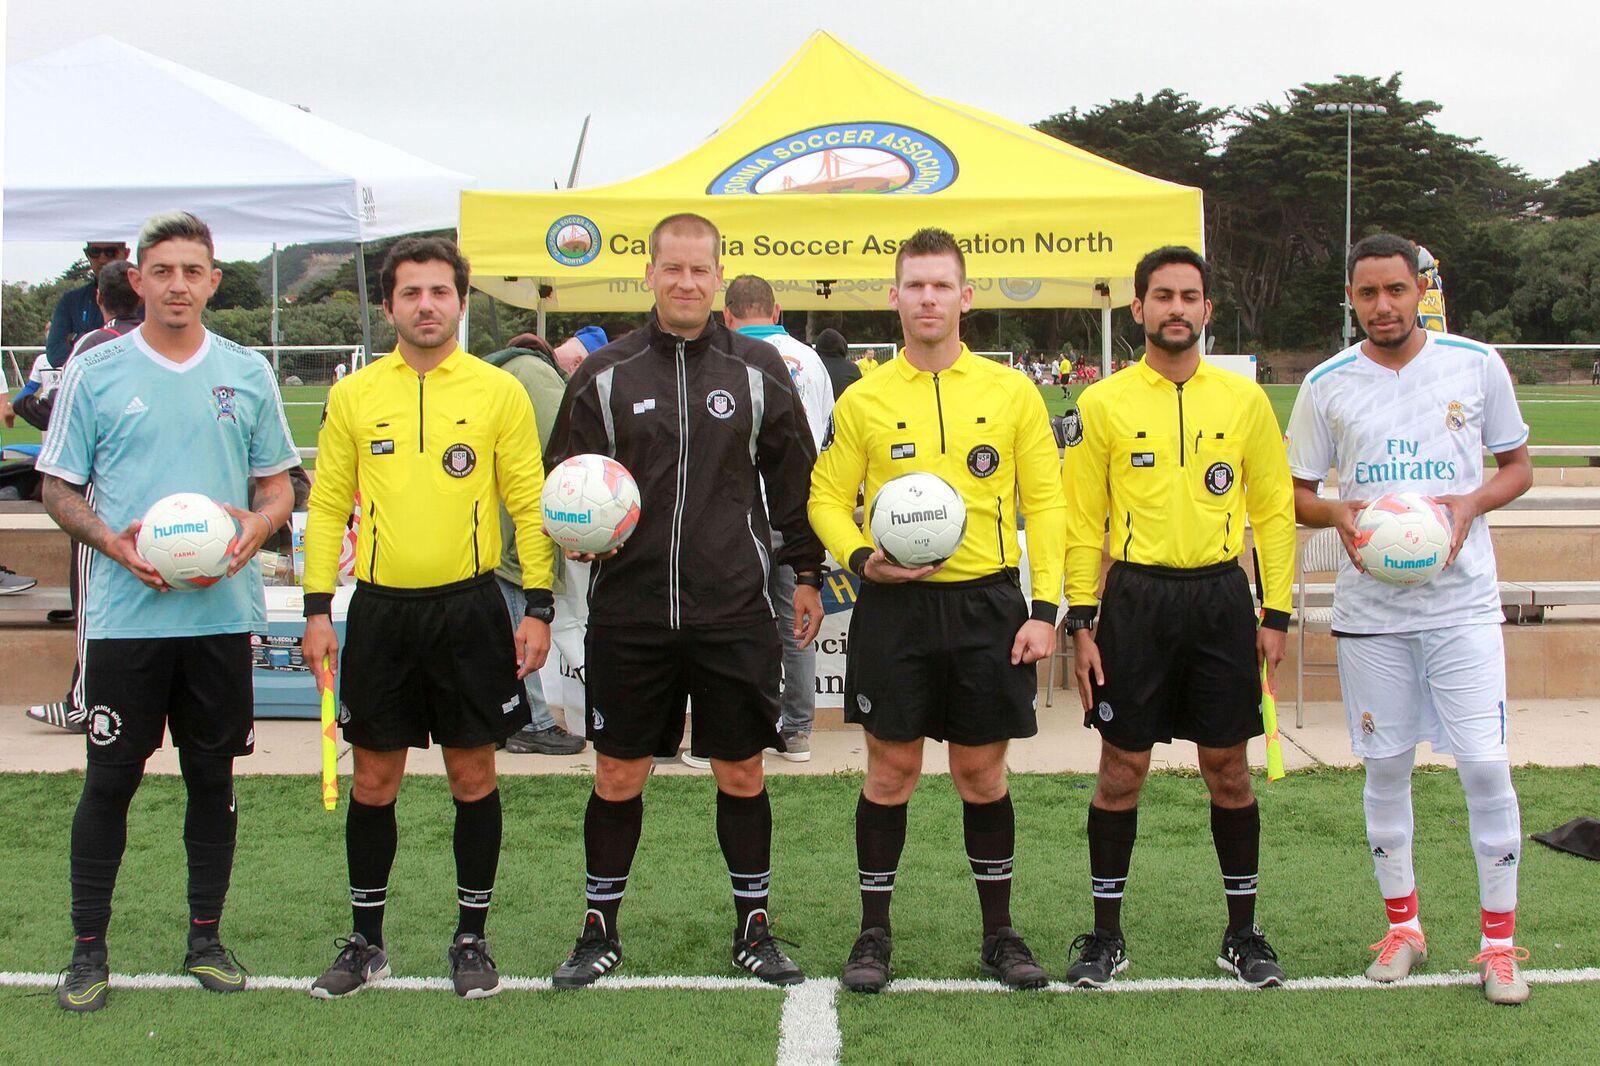 2017 CSAN-HUMMEL Sport State Cup1